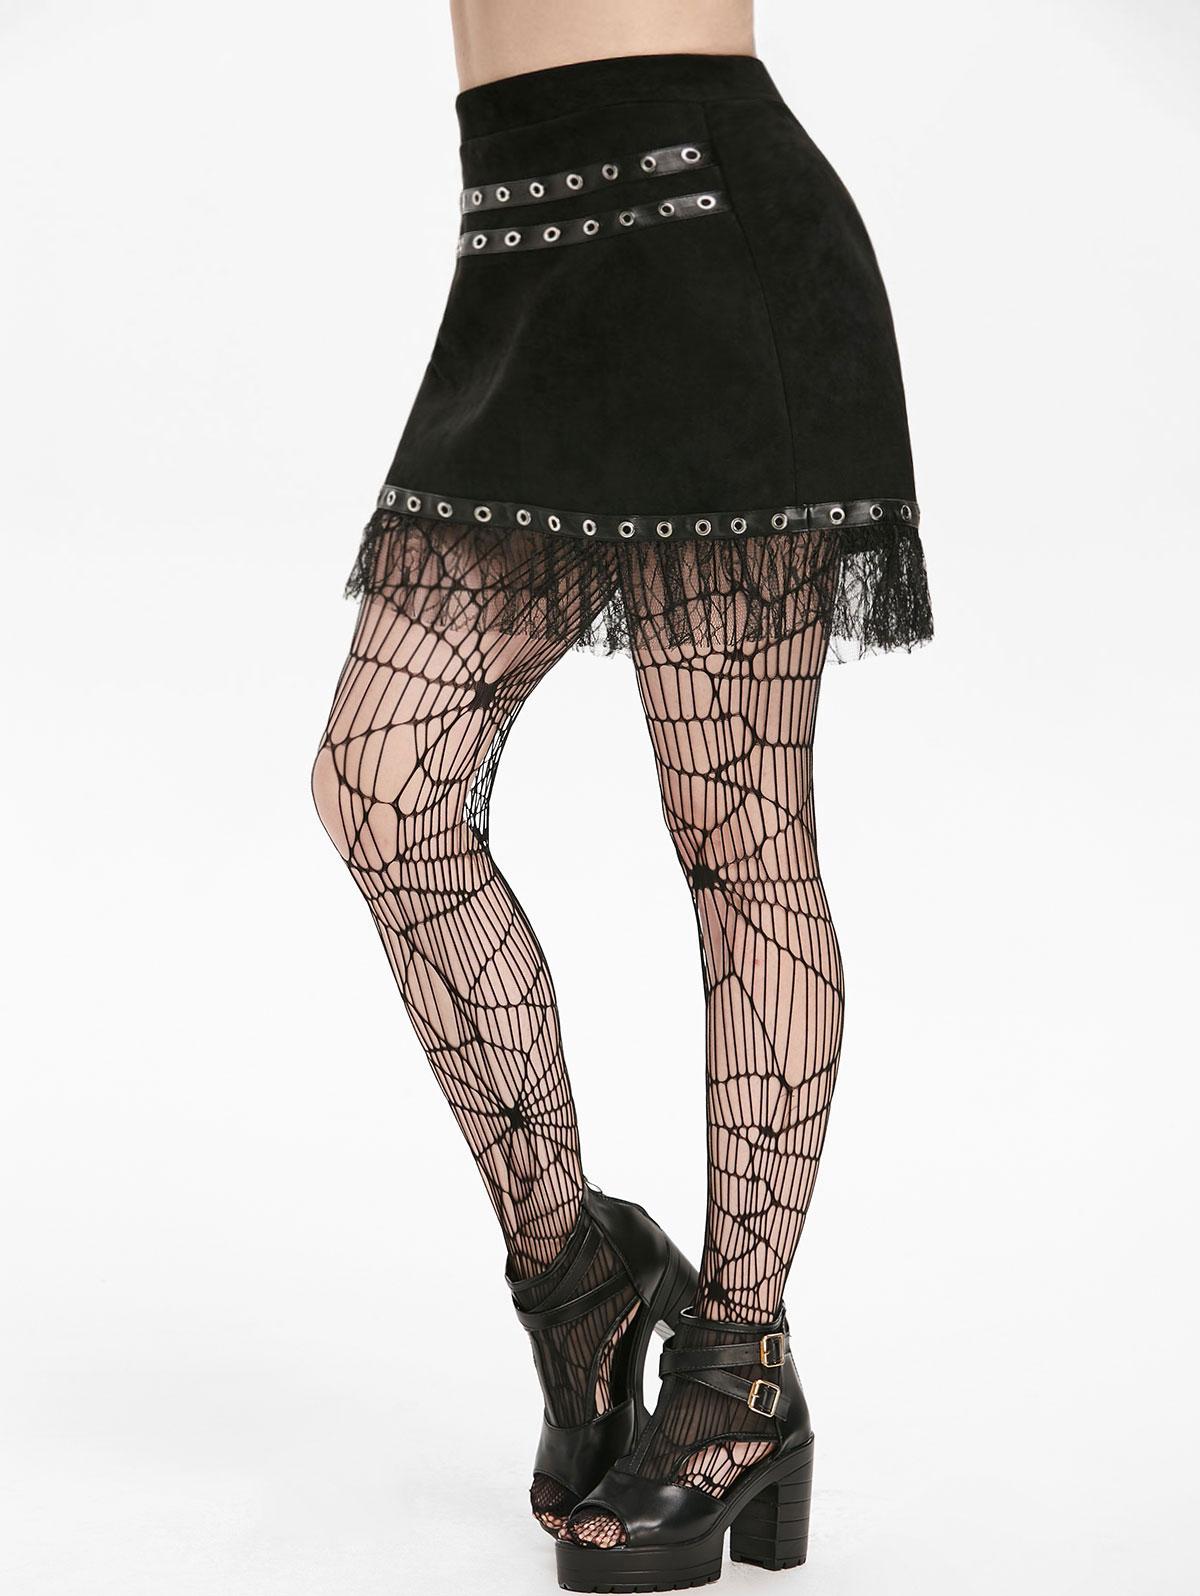 Wipalo Women Gothic Skirt Sexy Women Autumn PU Insert A Line Mini Skirts Zipper Solid Faux Suede Skirt Club Wear Goth 2019